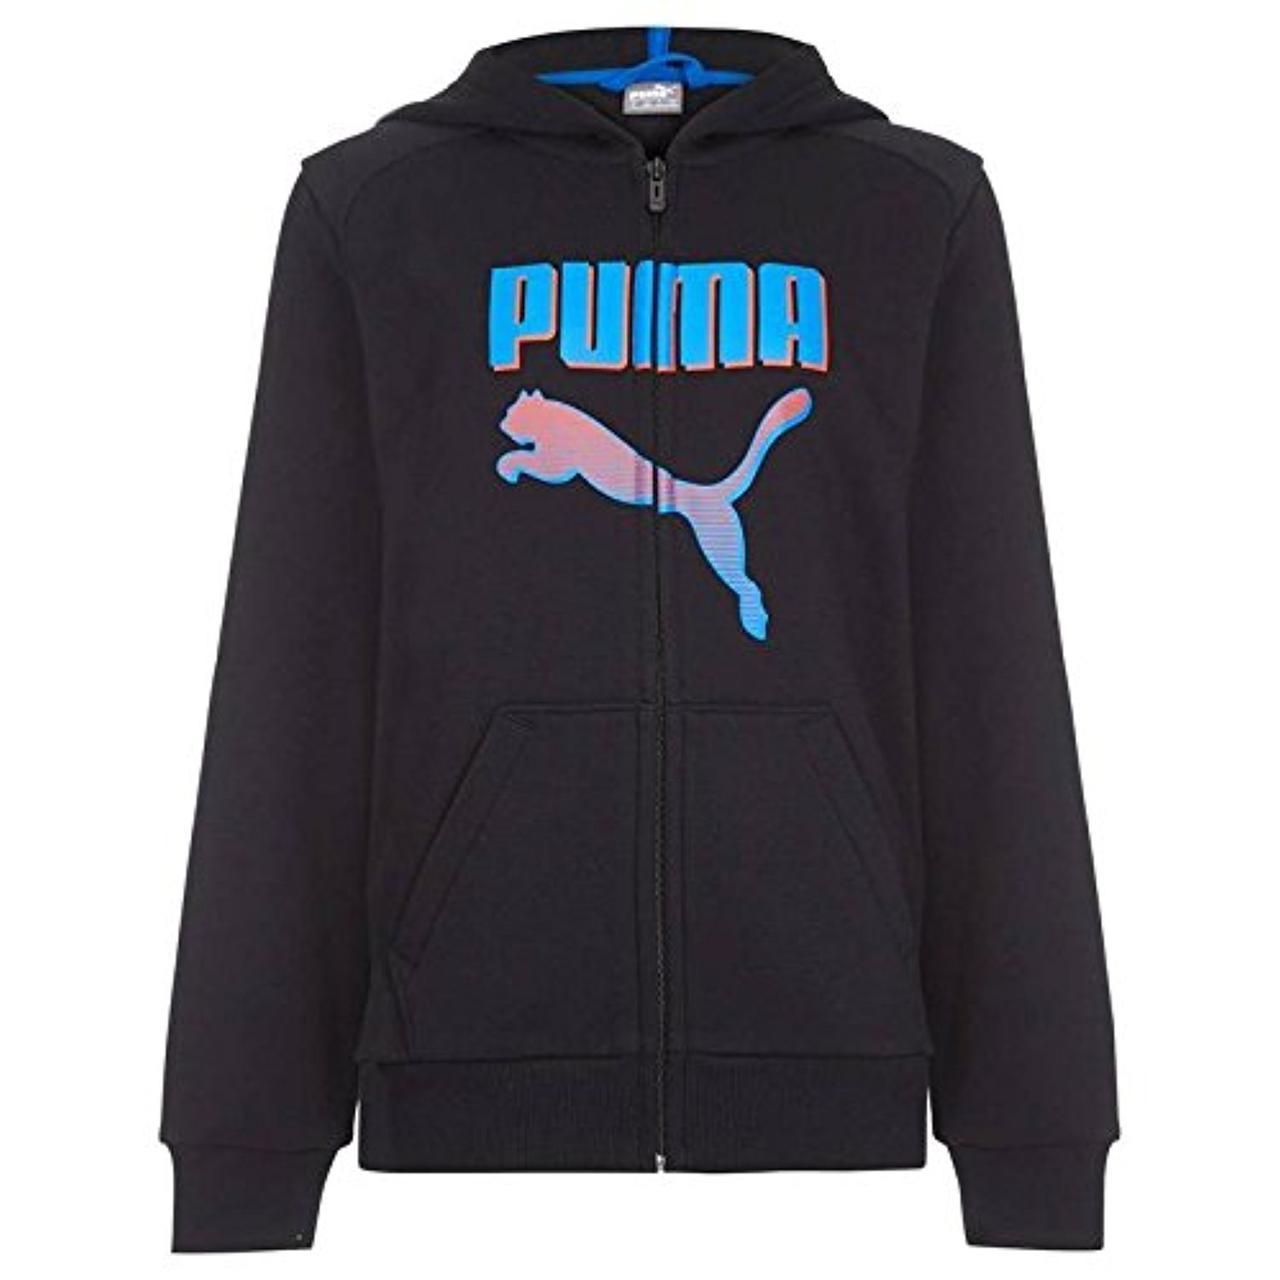 Худи флисовое на молнии Puma (США) (Размер  9-10 лет)